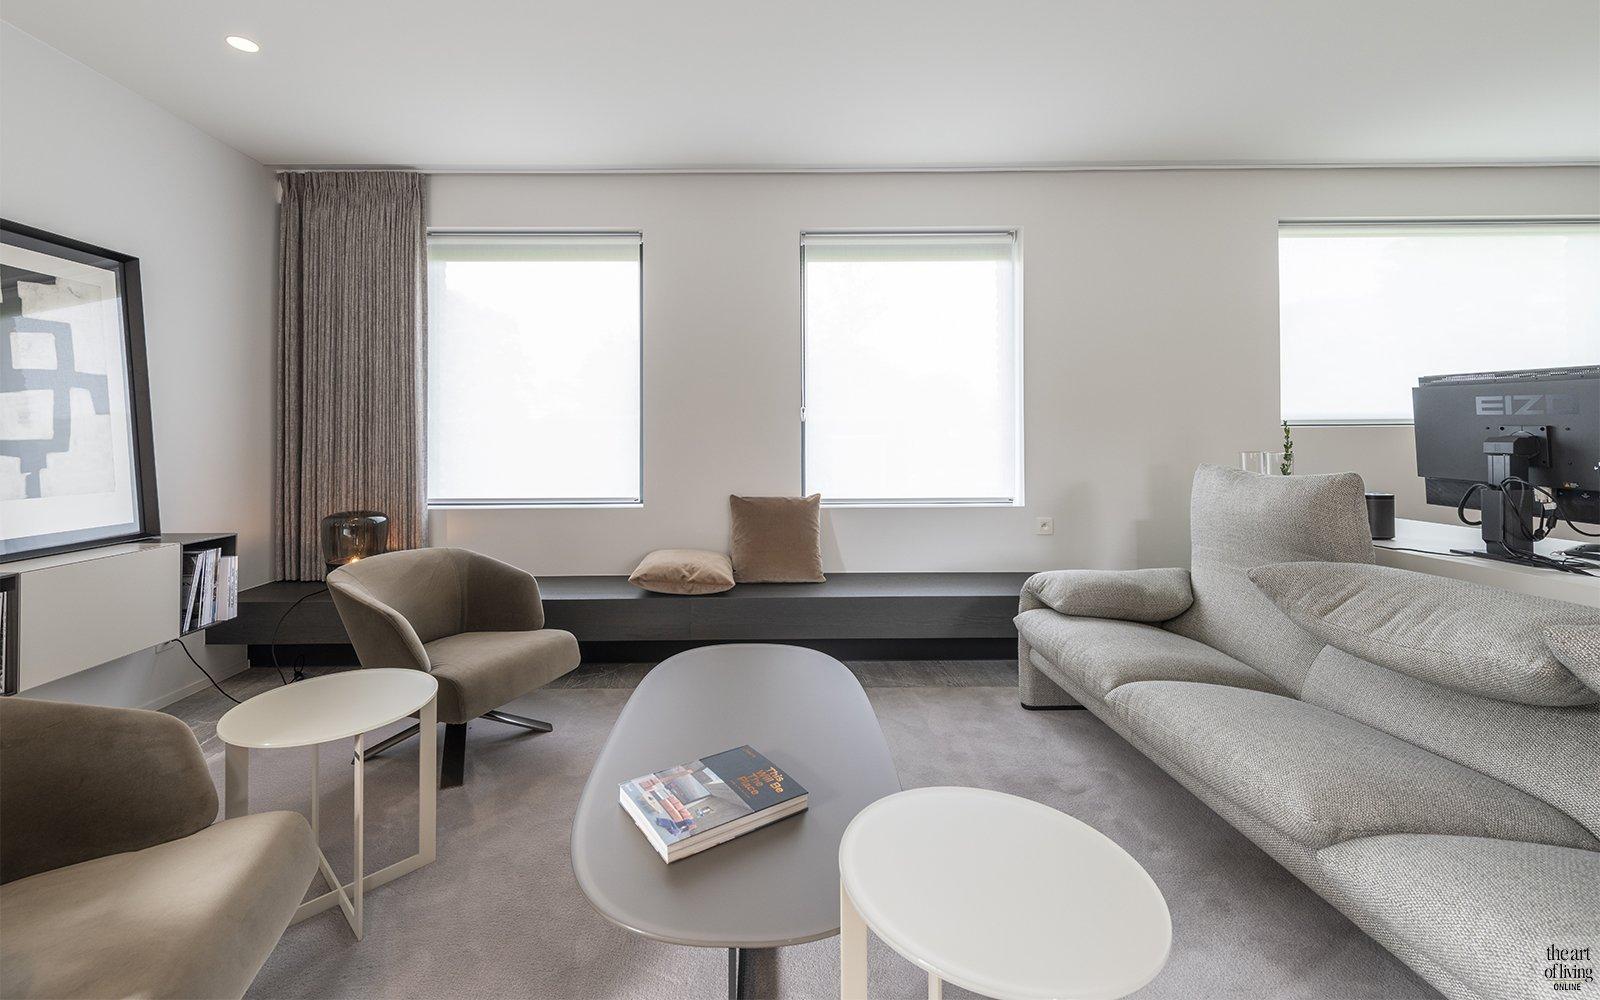 keuken van marmer, vijf interieurarchitectuur, the art of living, marmer